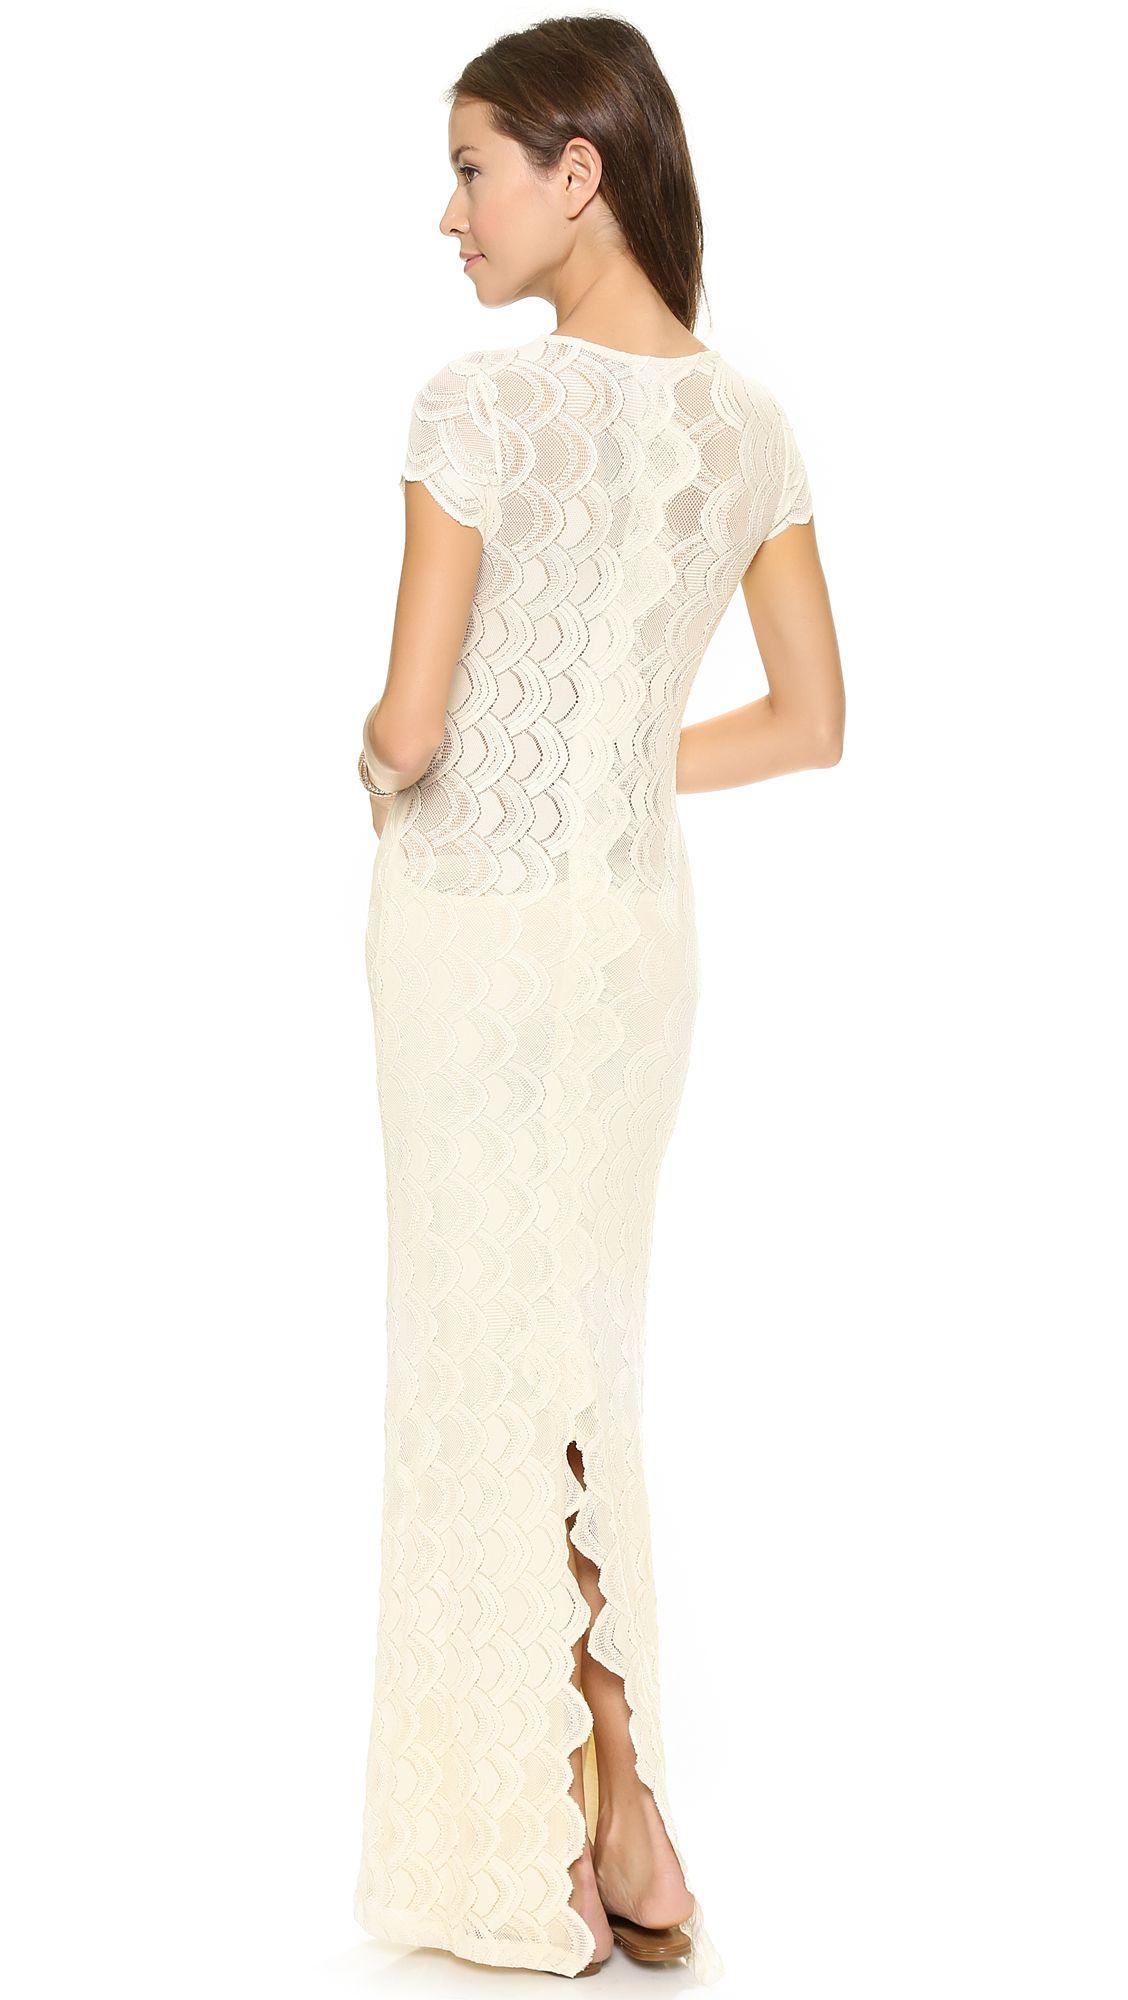 Nightcap victorian lace dress